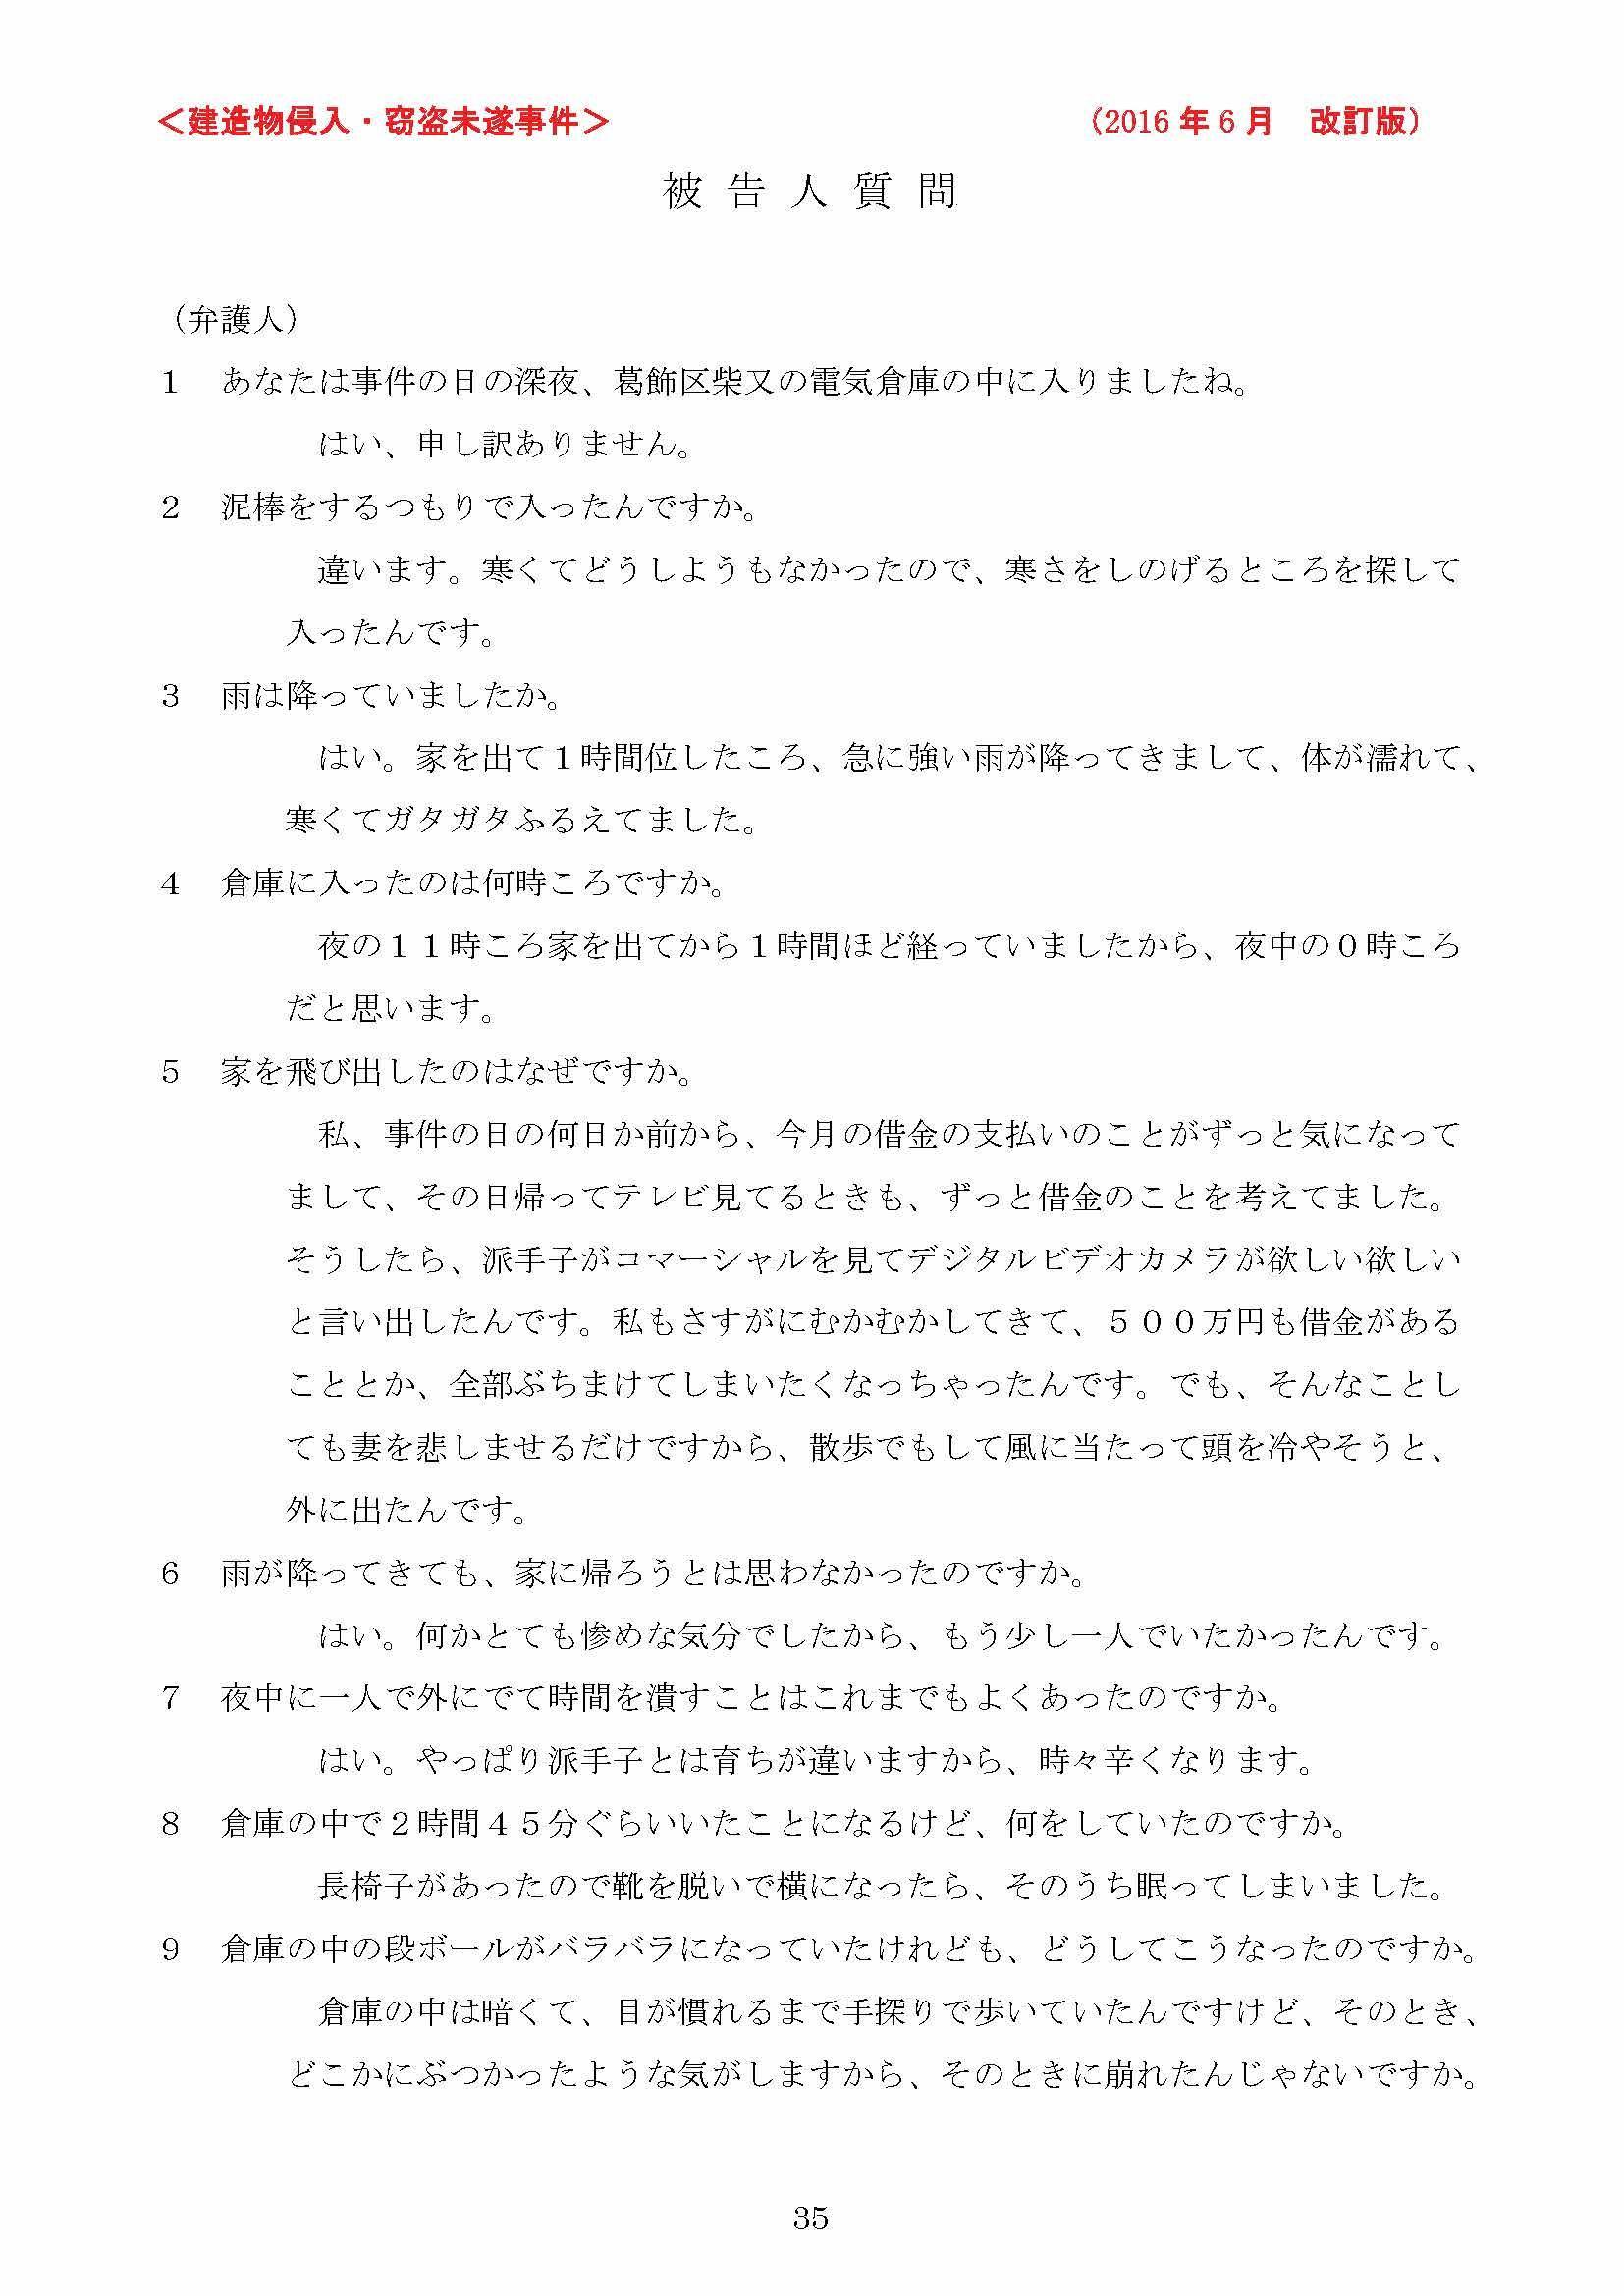 kenzoubutsu_4.jpg